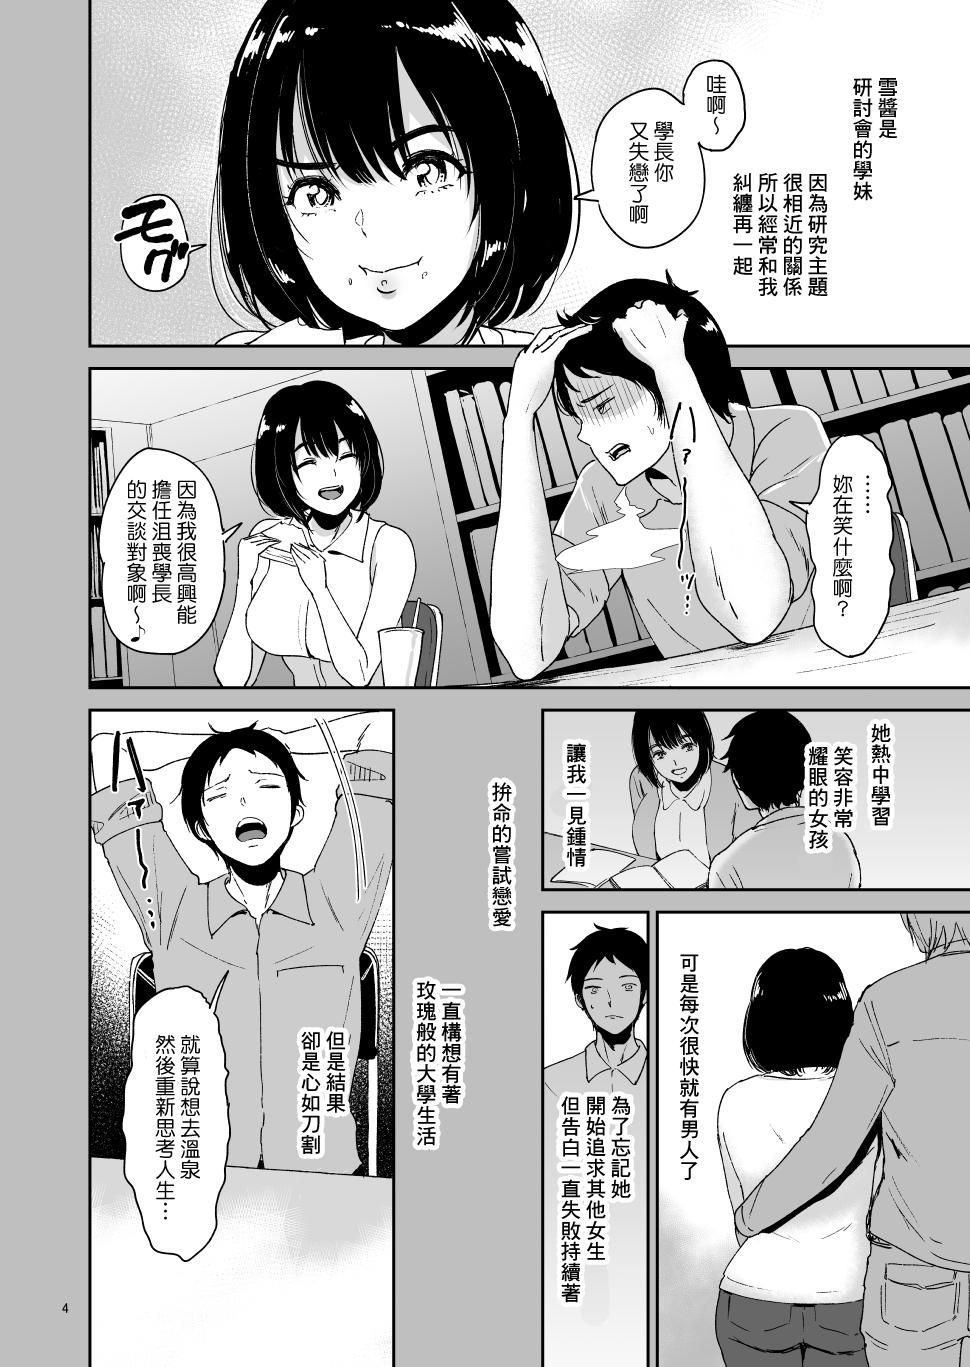 [yogurt (bifidus)] Kouhai Tanetsuke Onsen - Nishimura Yuki-chan ni Marking [Chinese] [Digital] 2